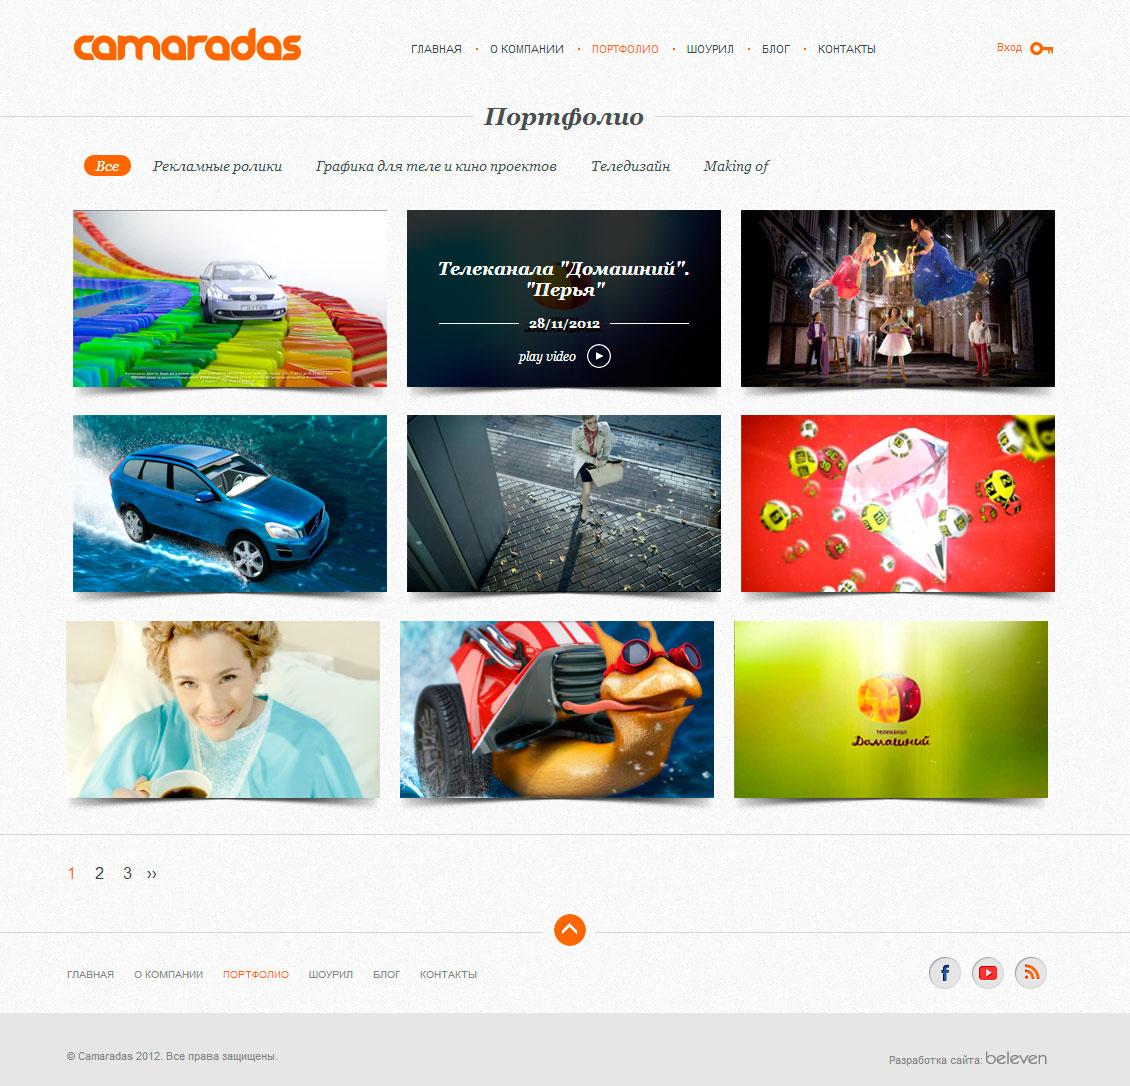 Camaradas - видео студия / Портфолио